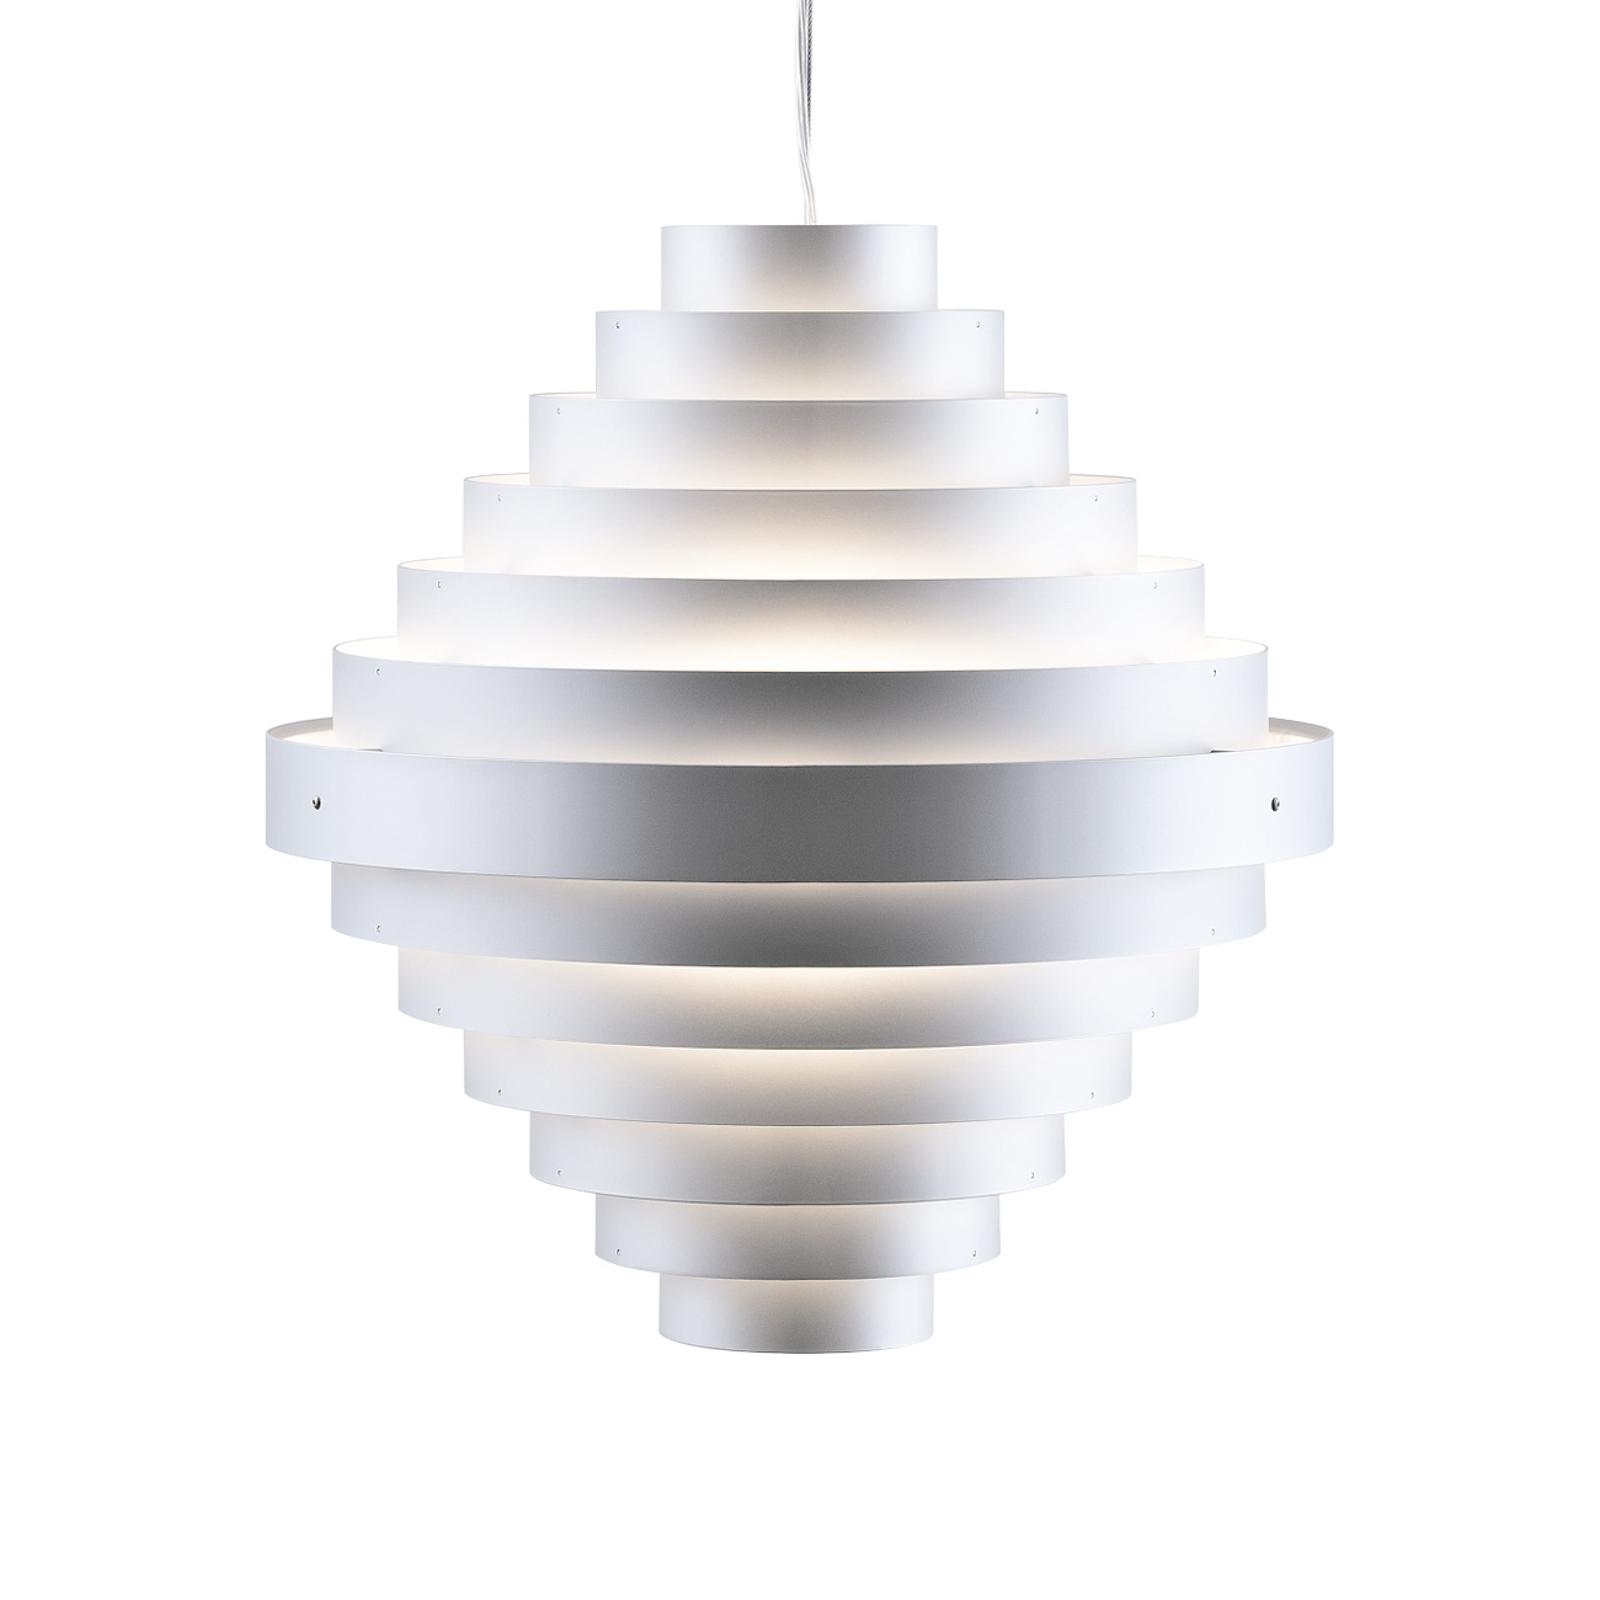 WEVER & DUCRÉ J.J.W. 05 hanglamp, zilver